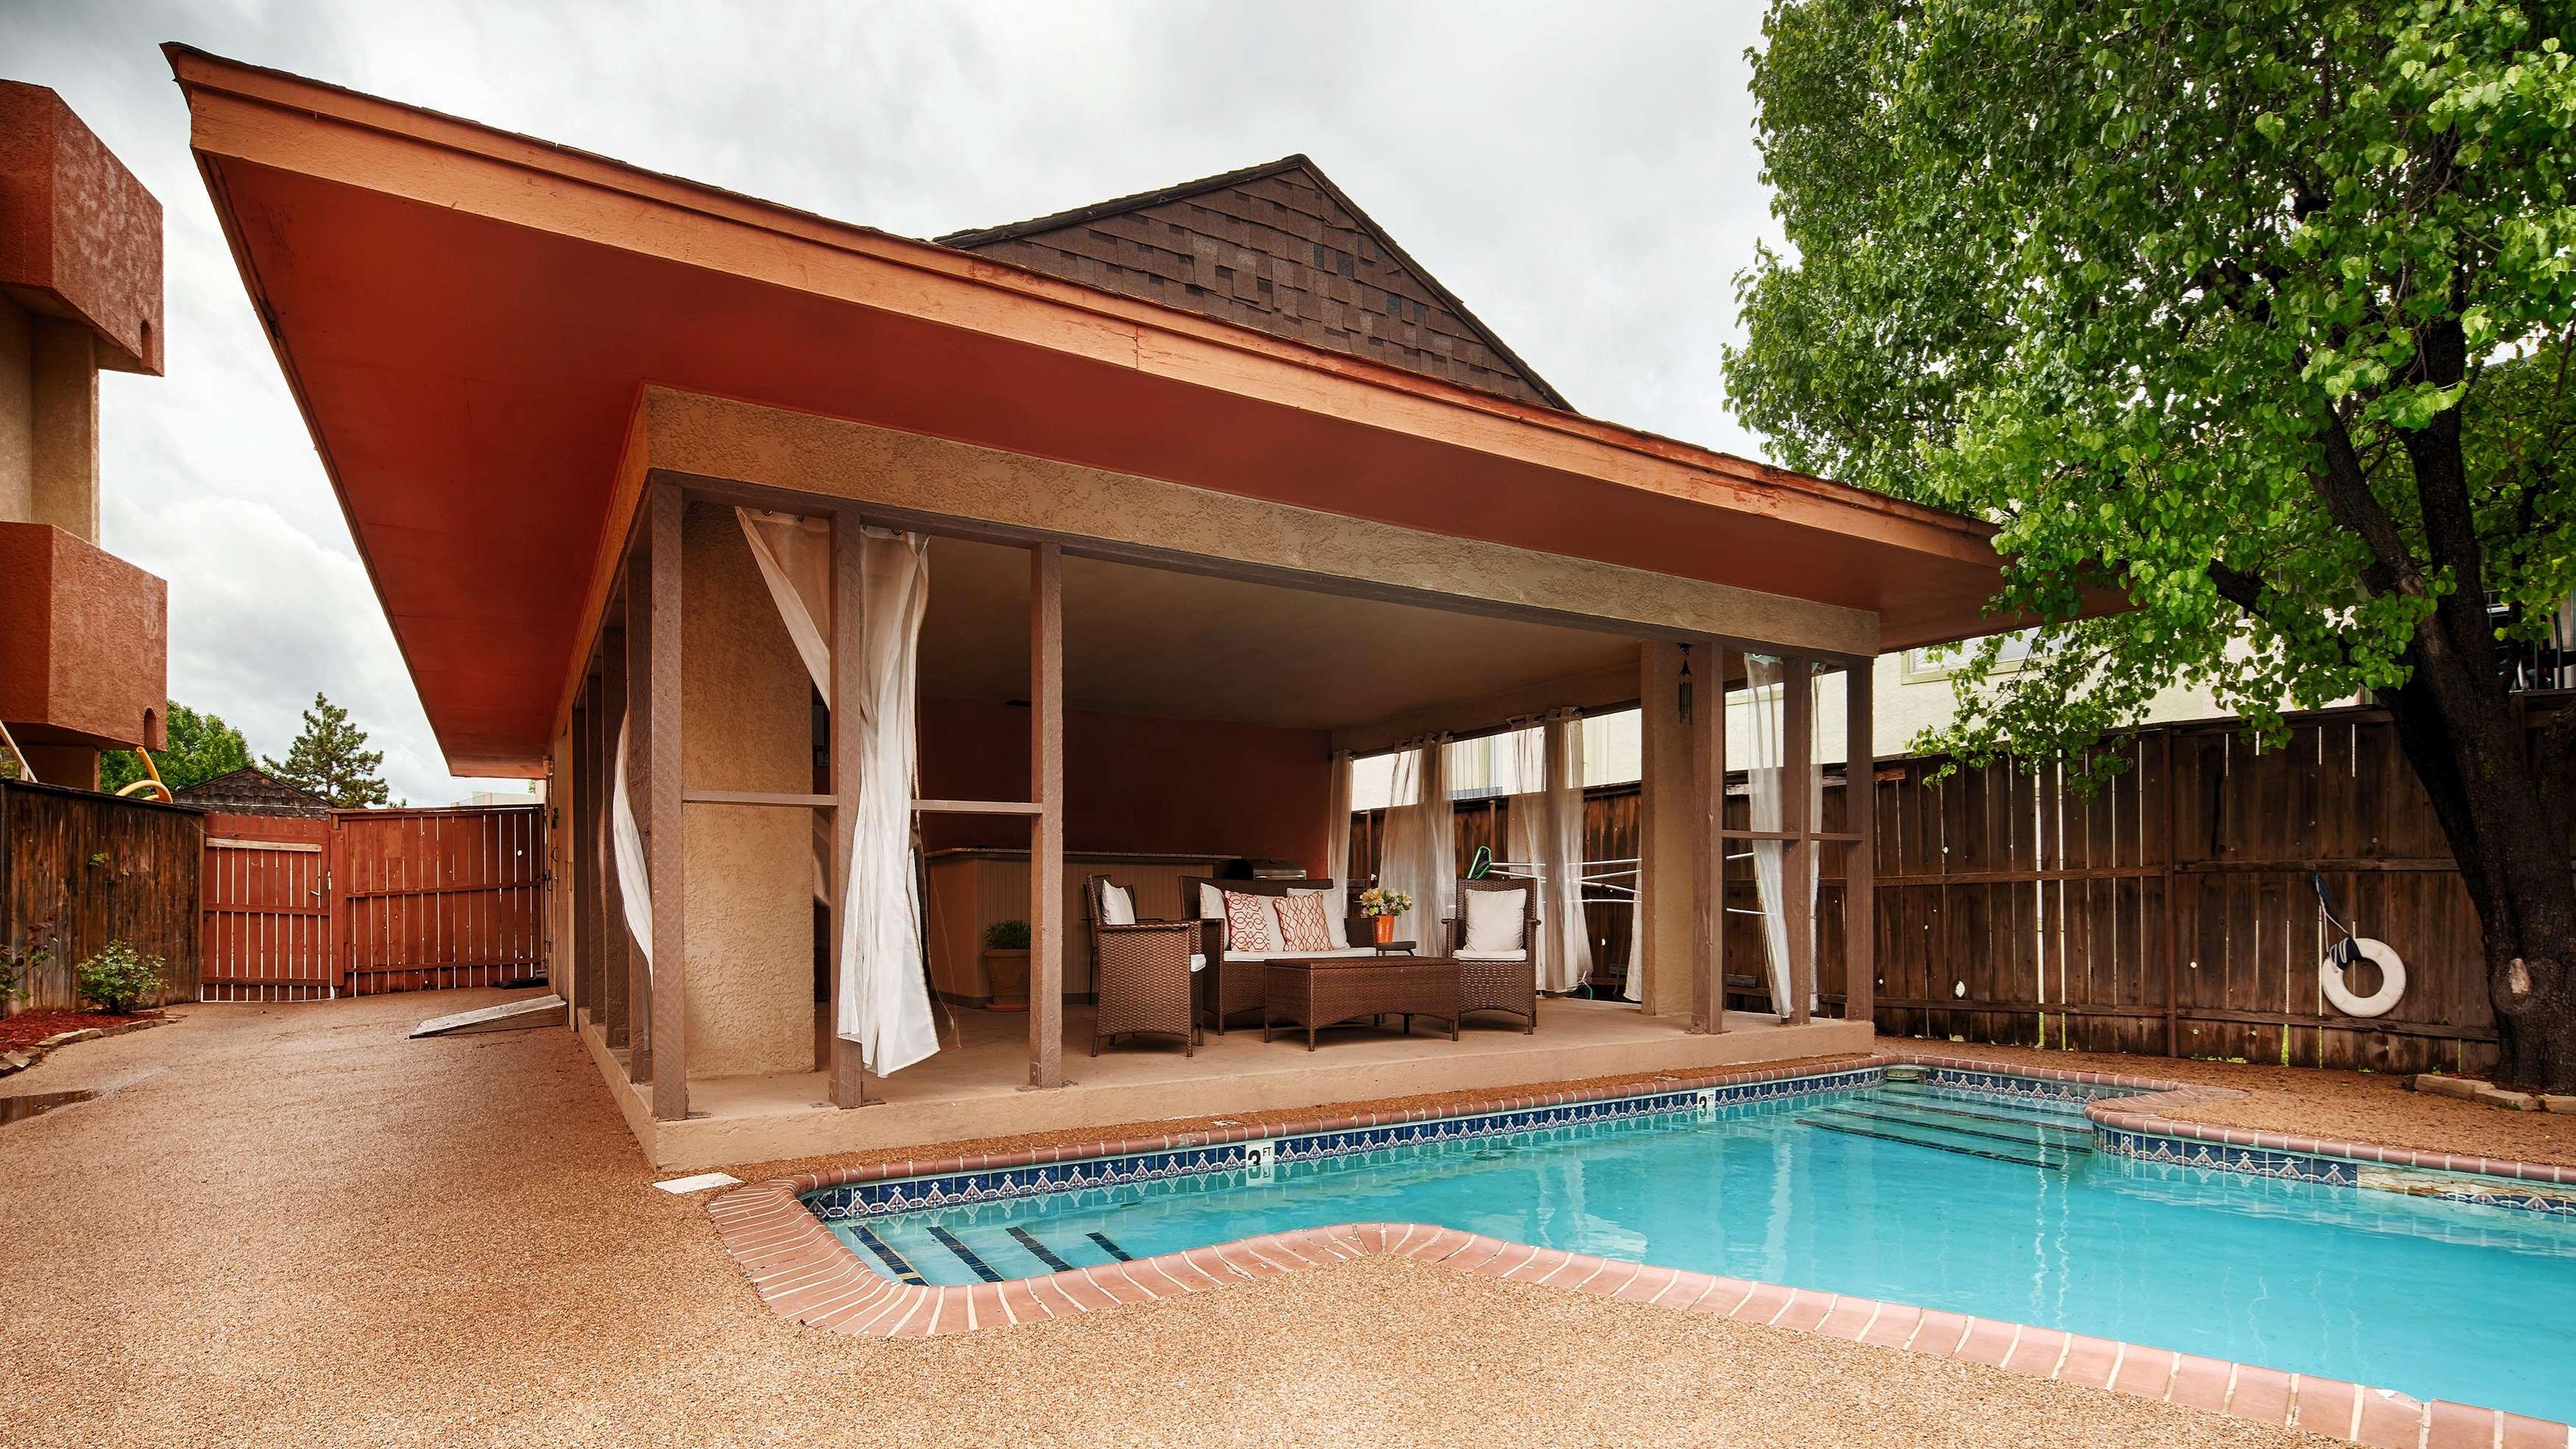 Best Western Plus Lawton Hotel & Convention Center image 6